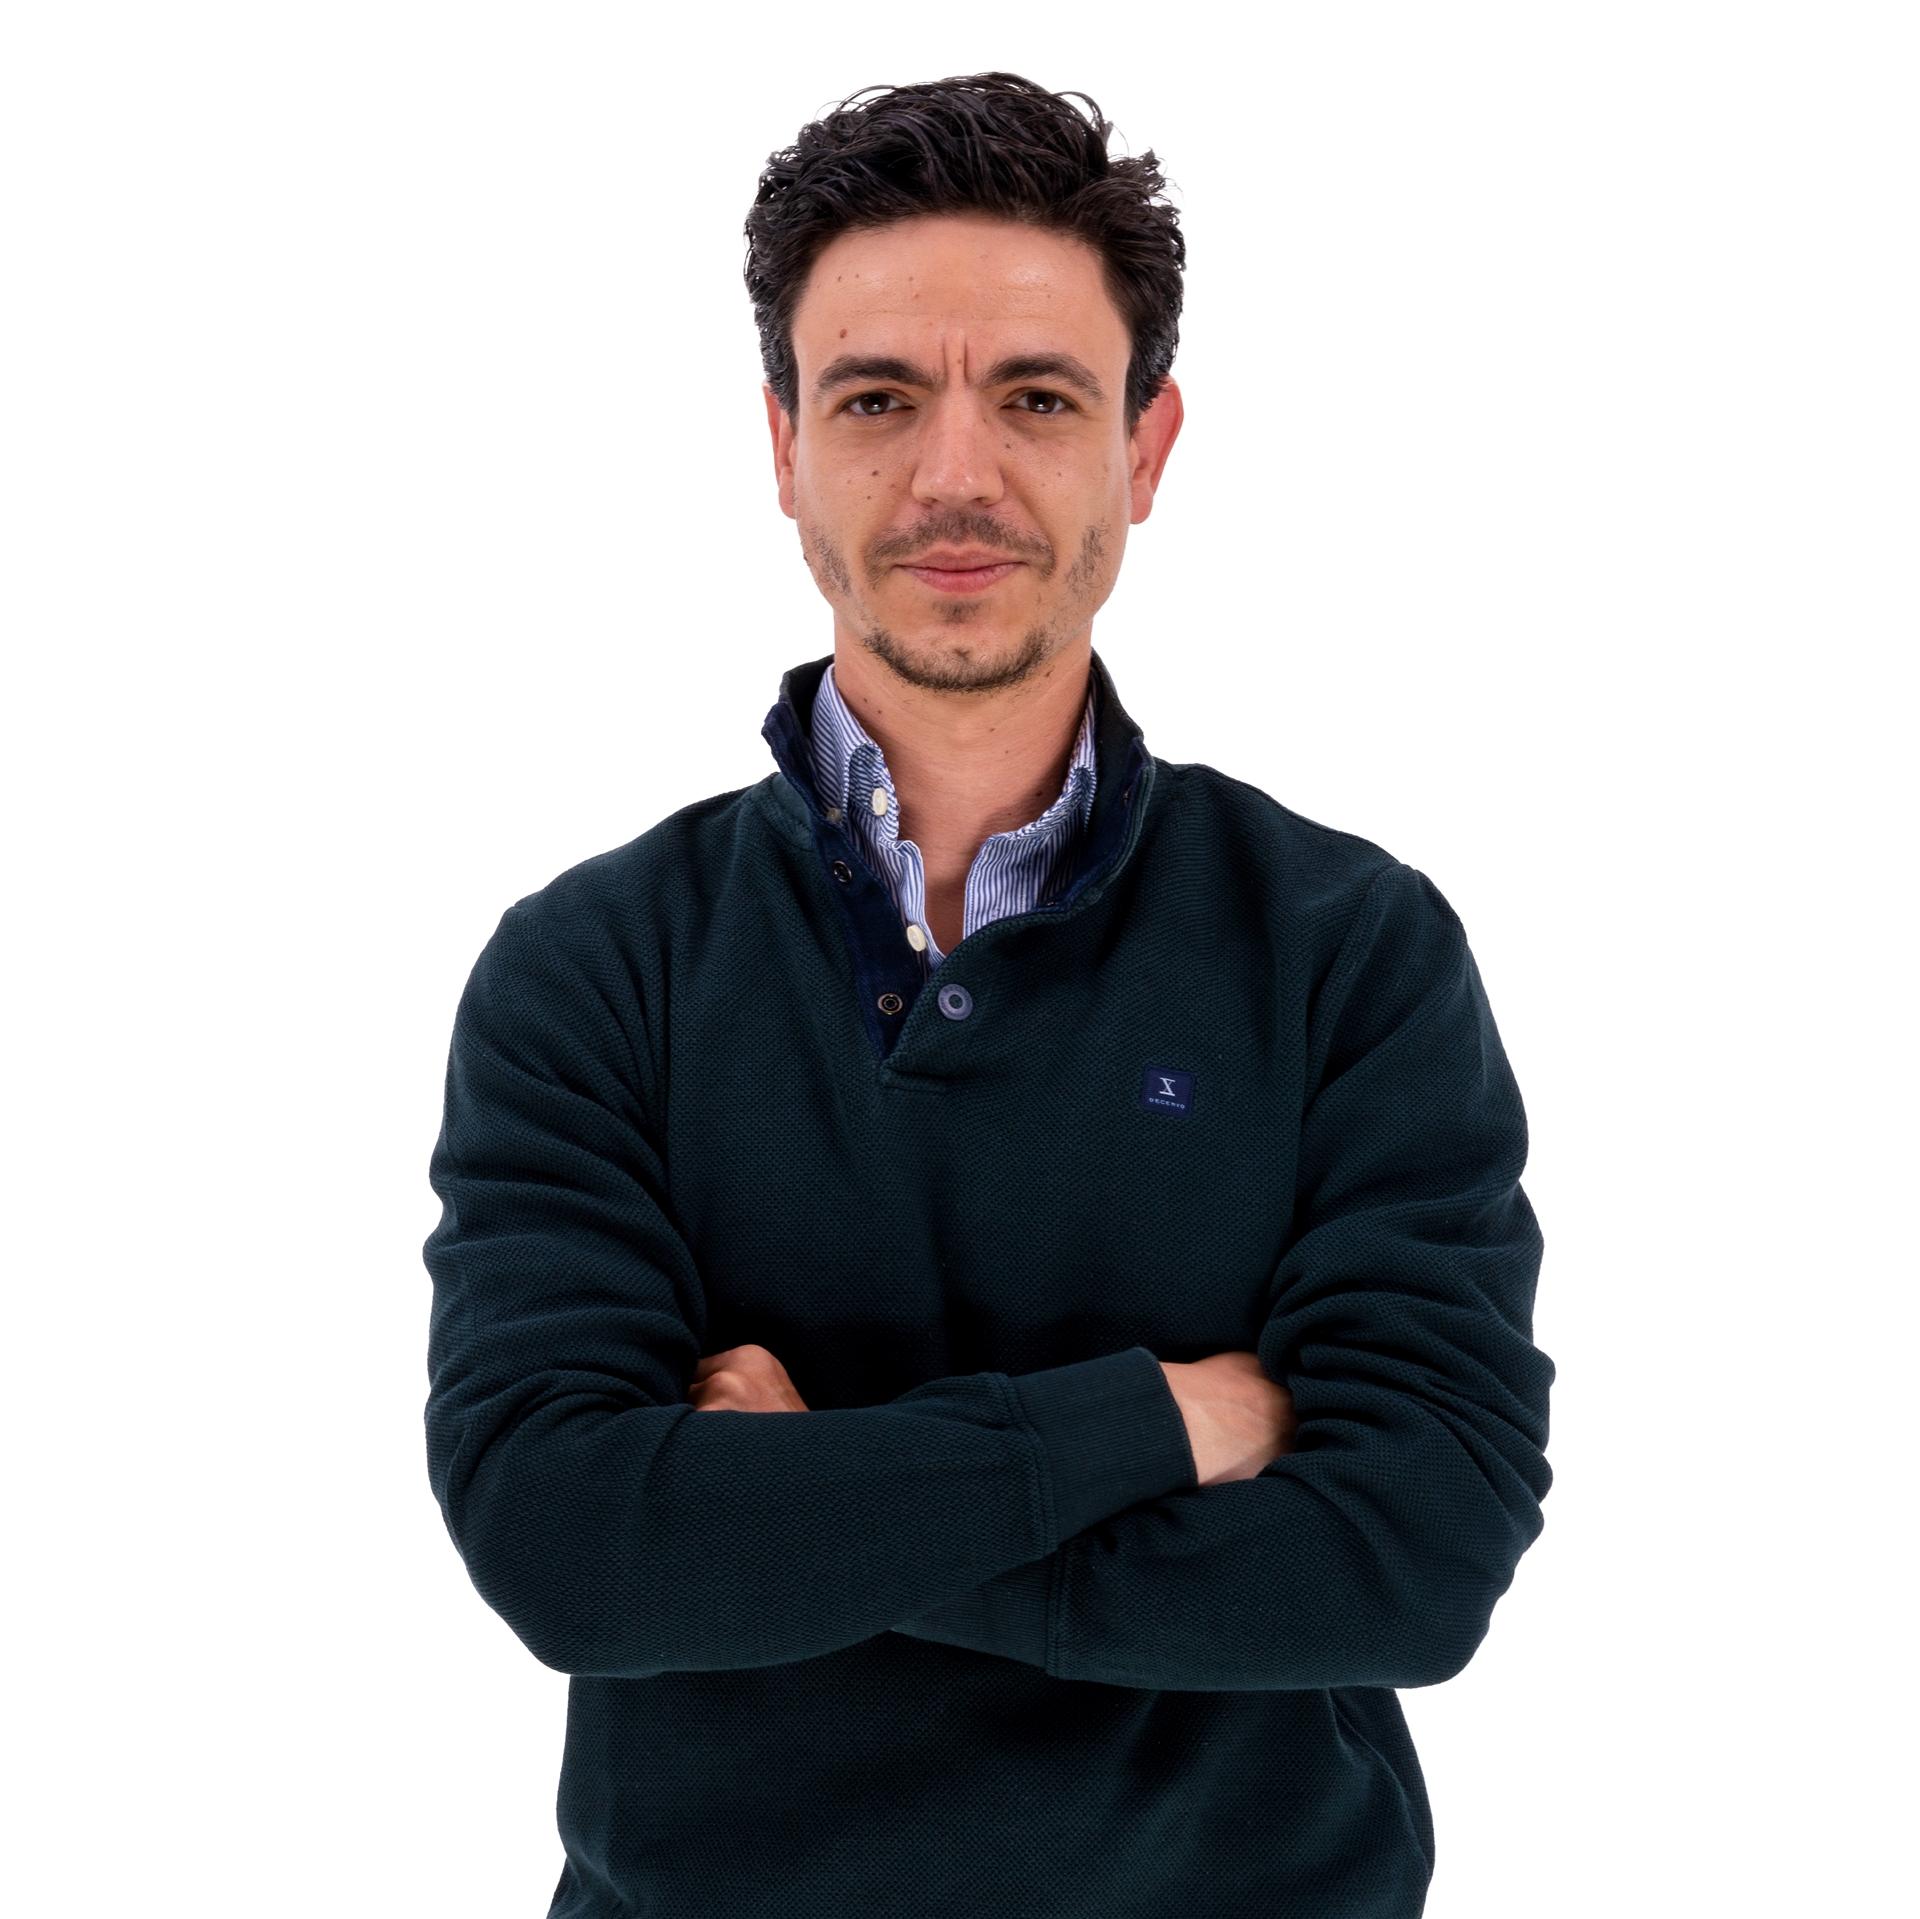 Alexandre Correia